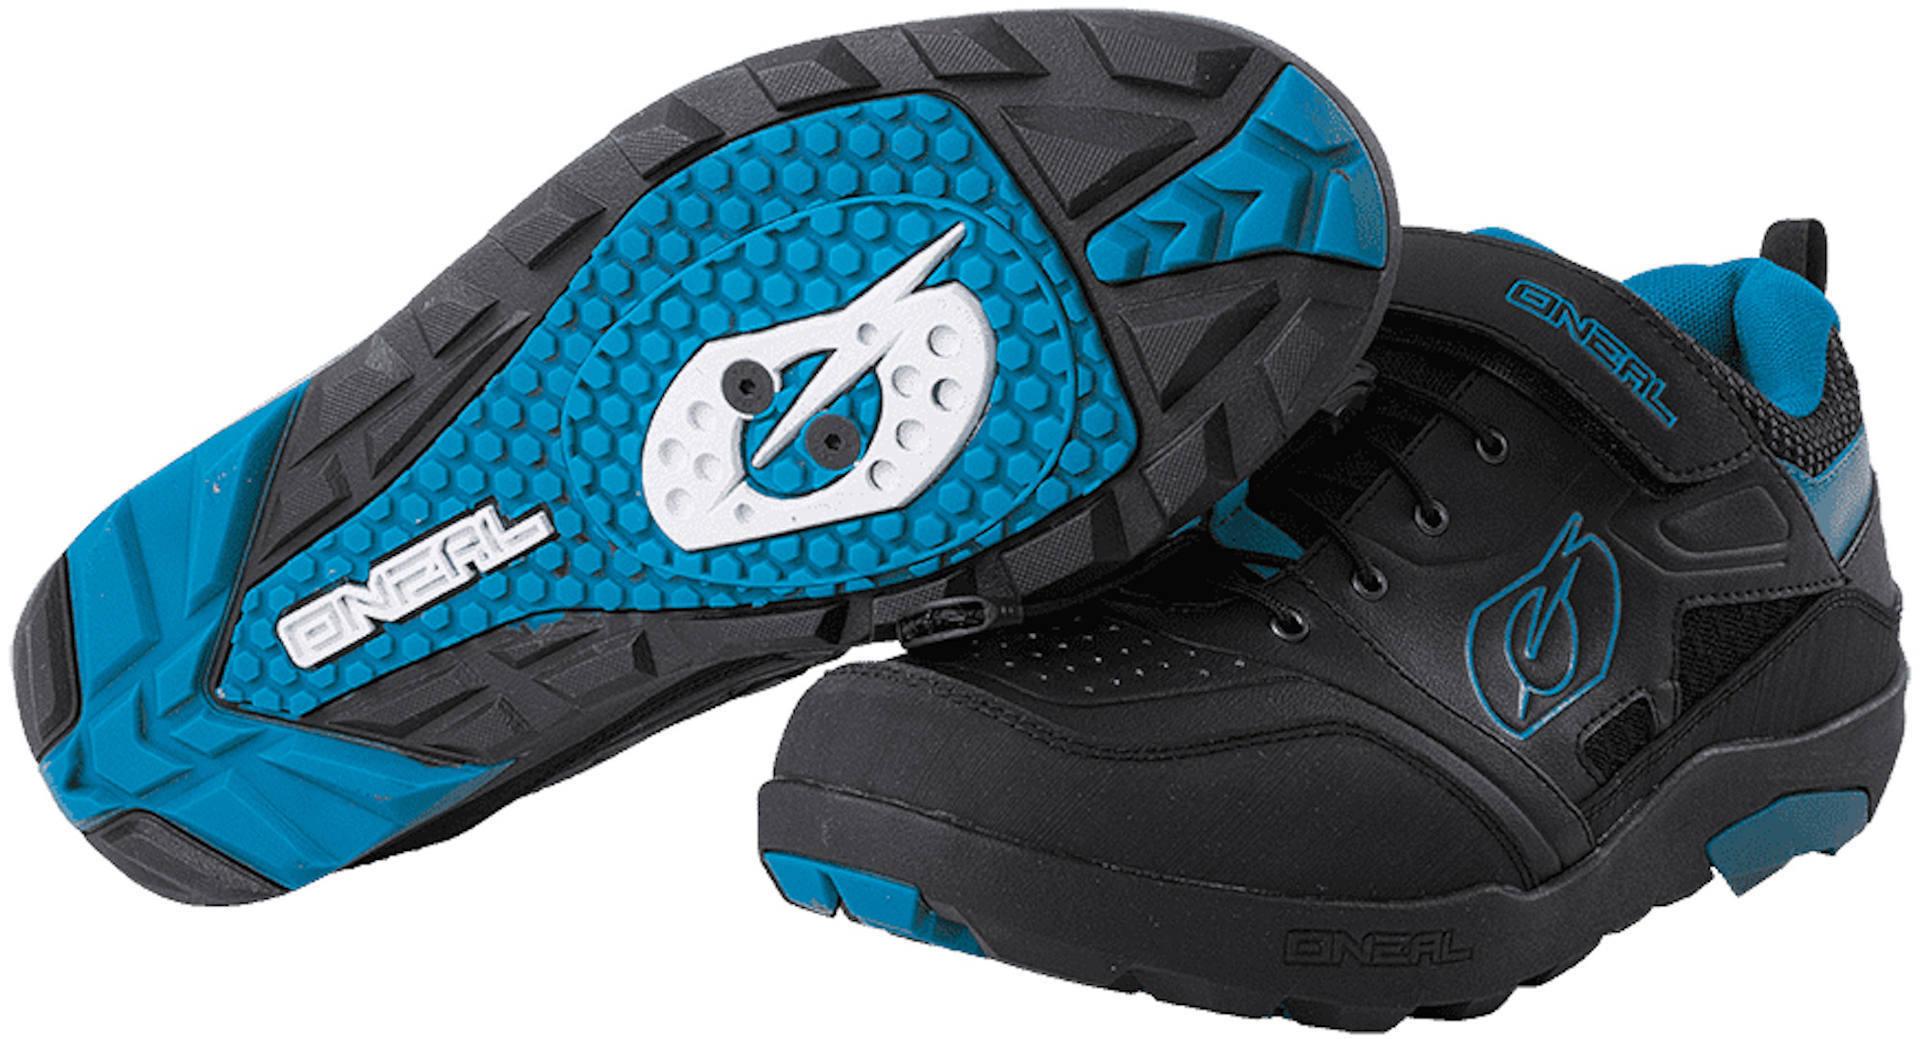 Oneal Traverse SPD Shoes Black Blue 40